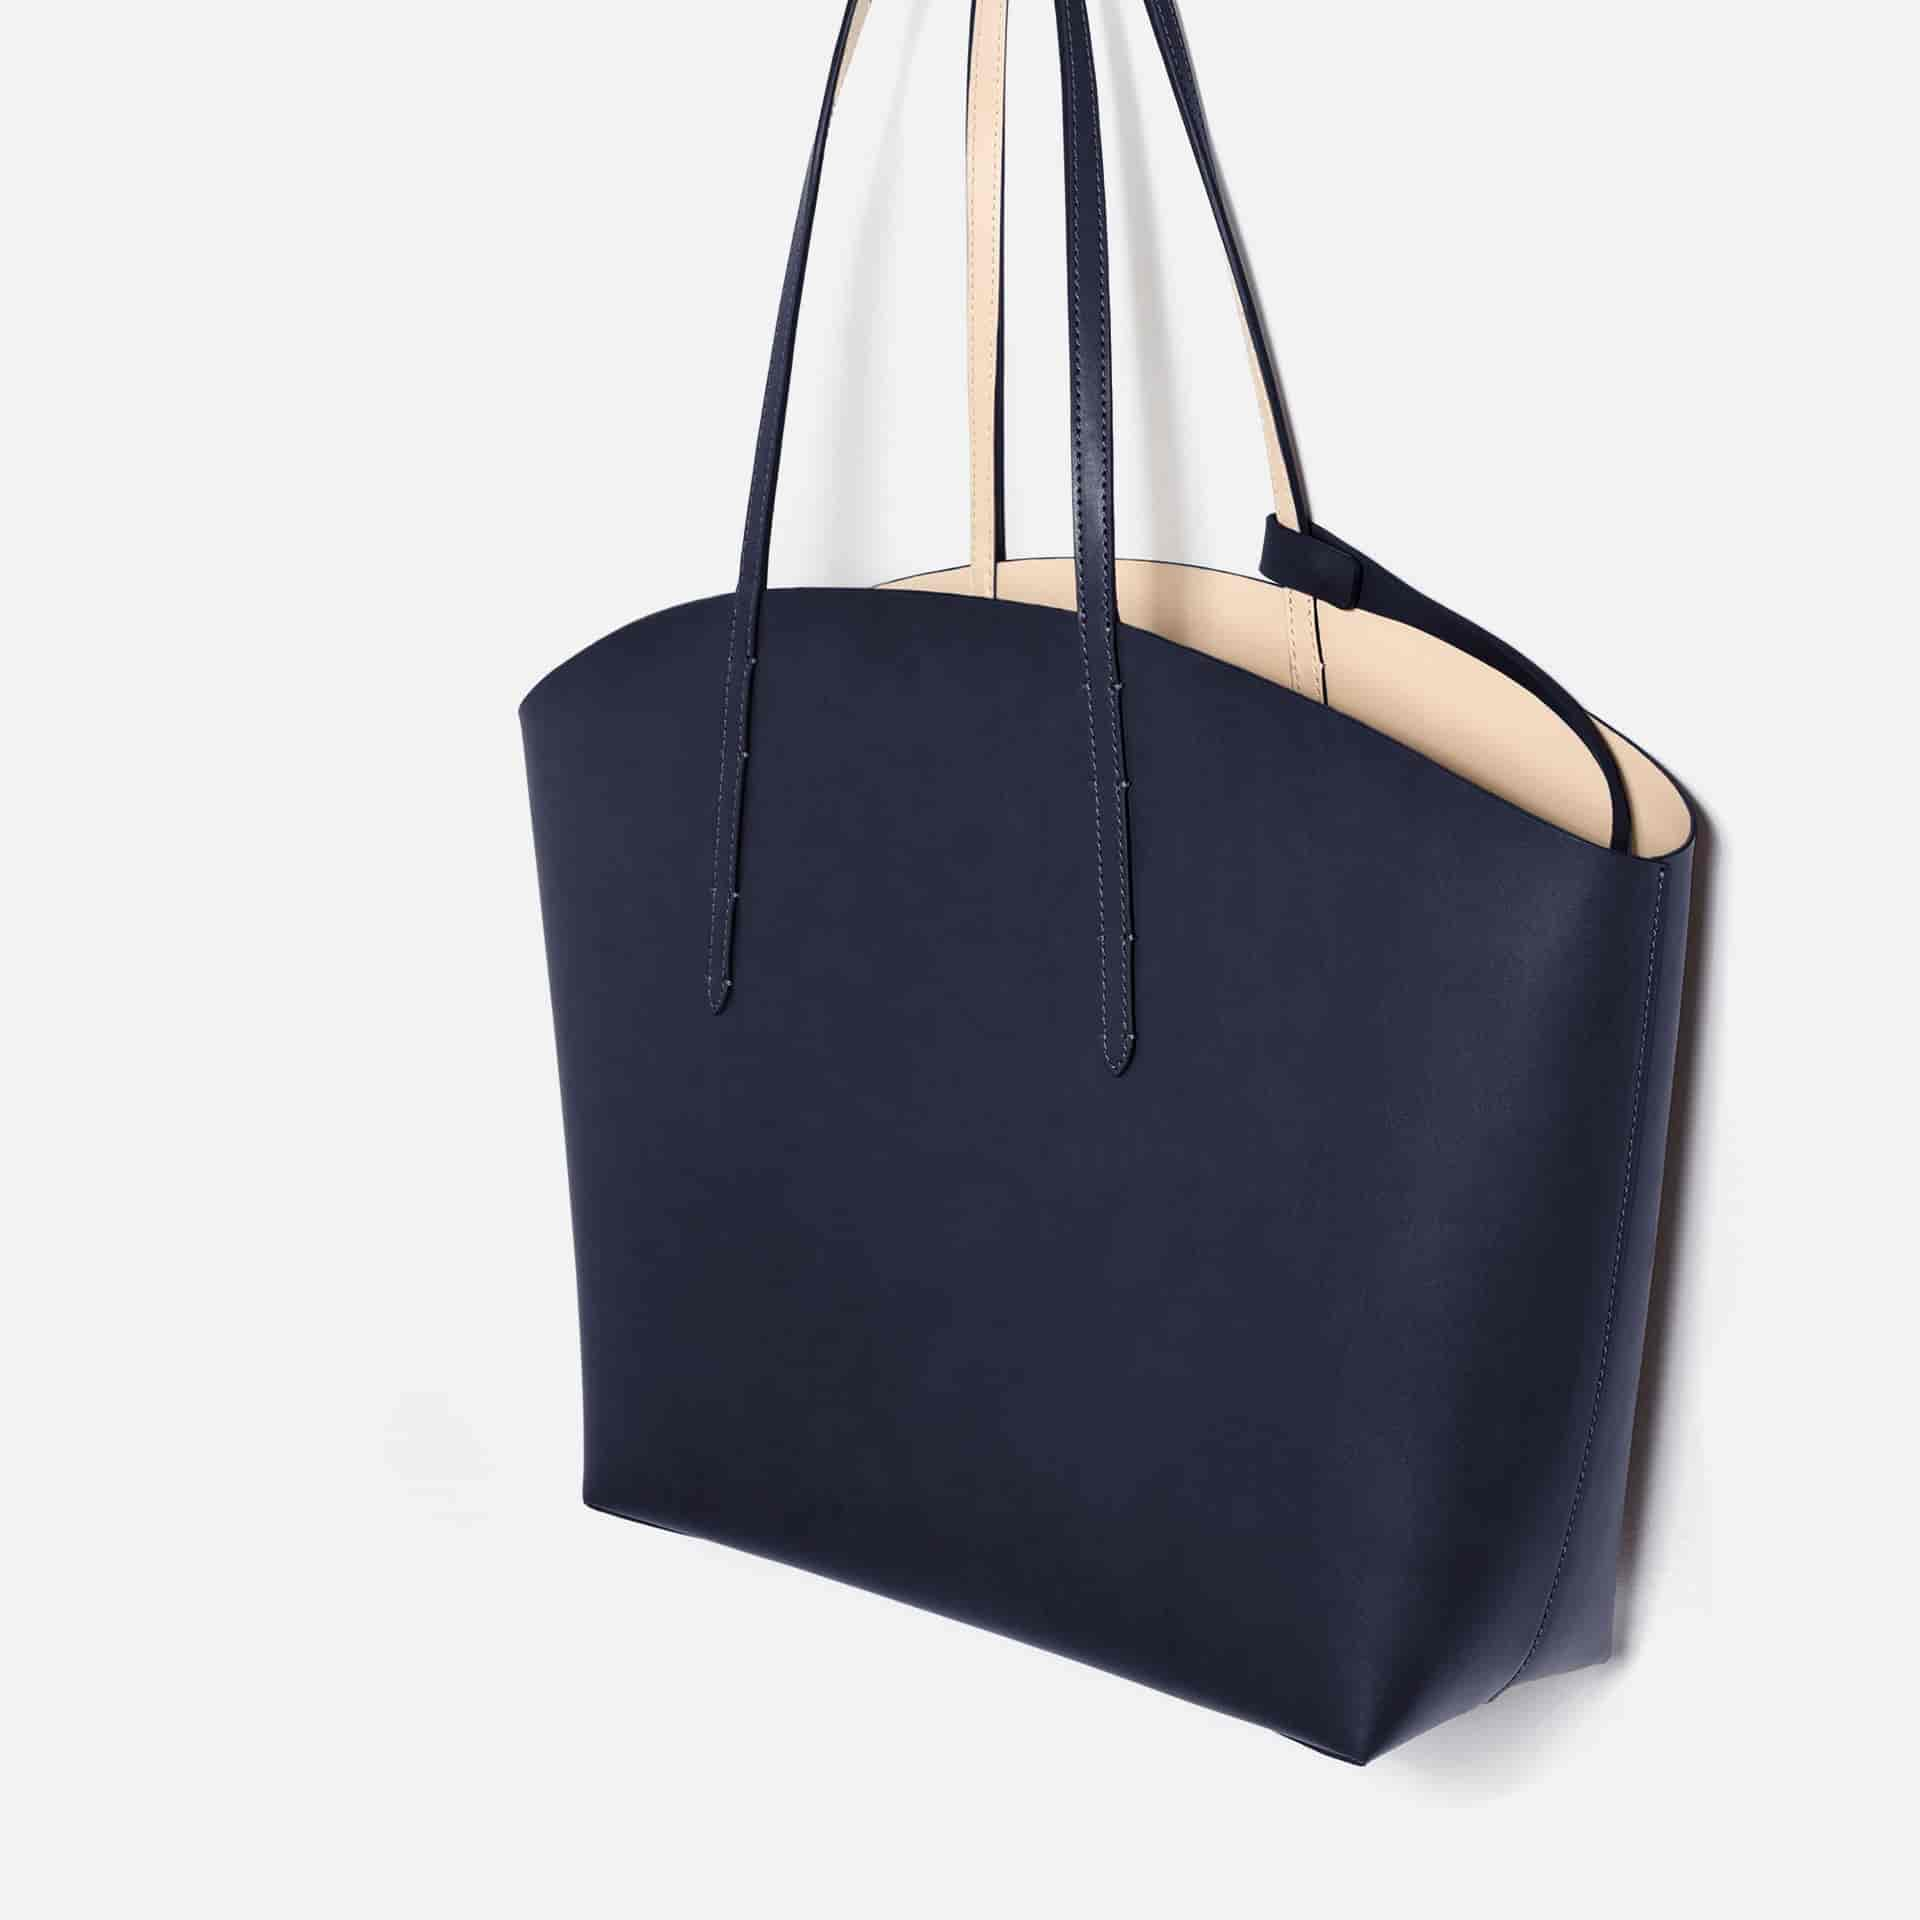 Zara Tote Bag Leather 4311 104